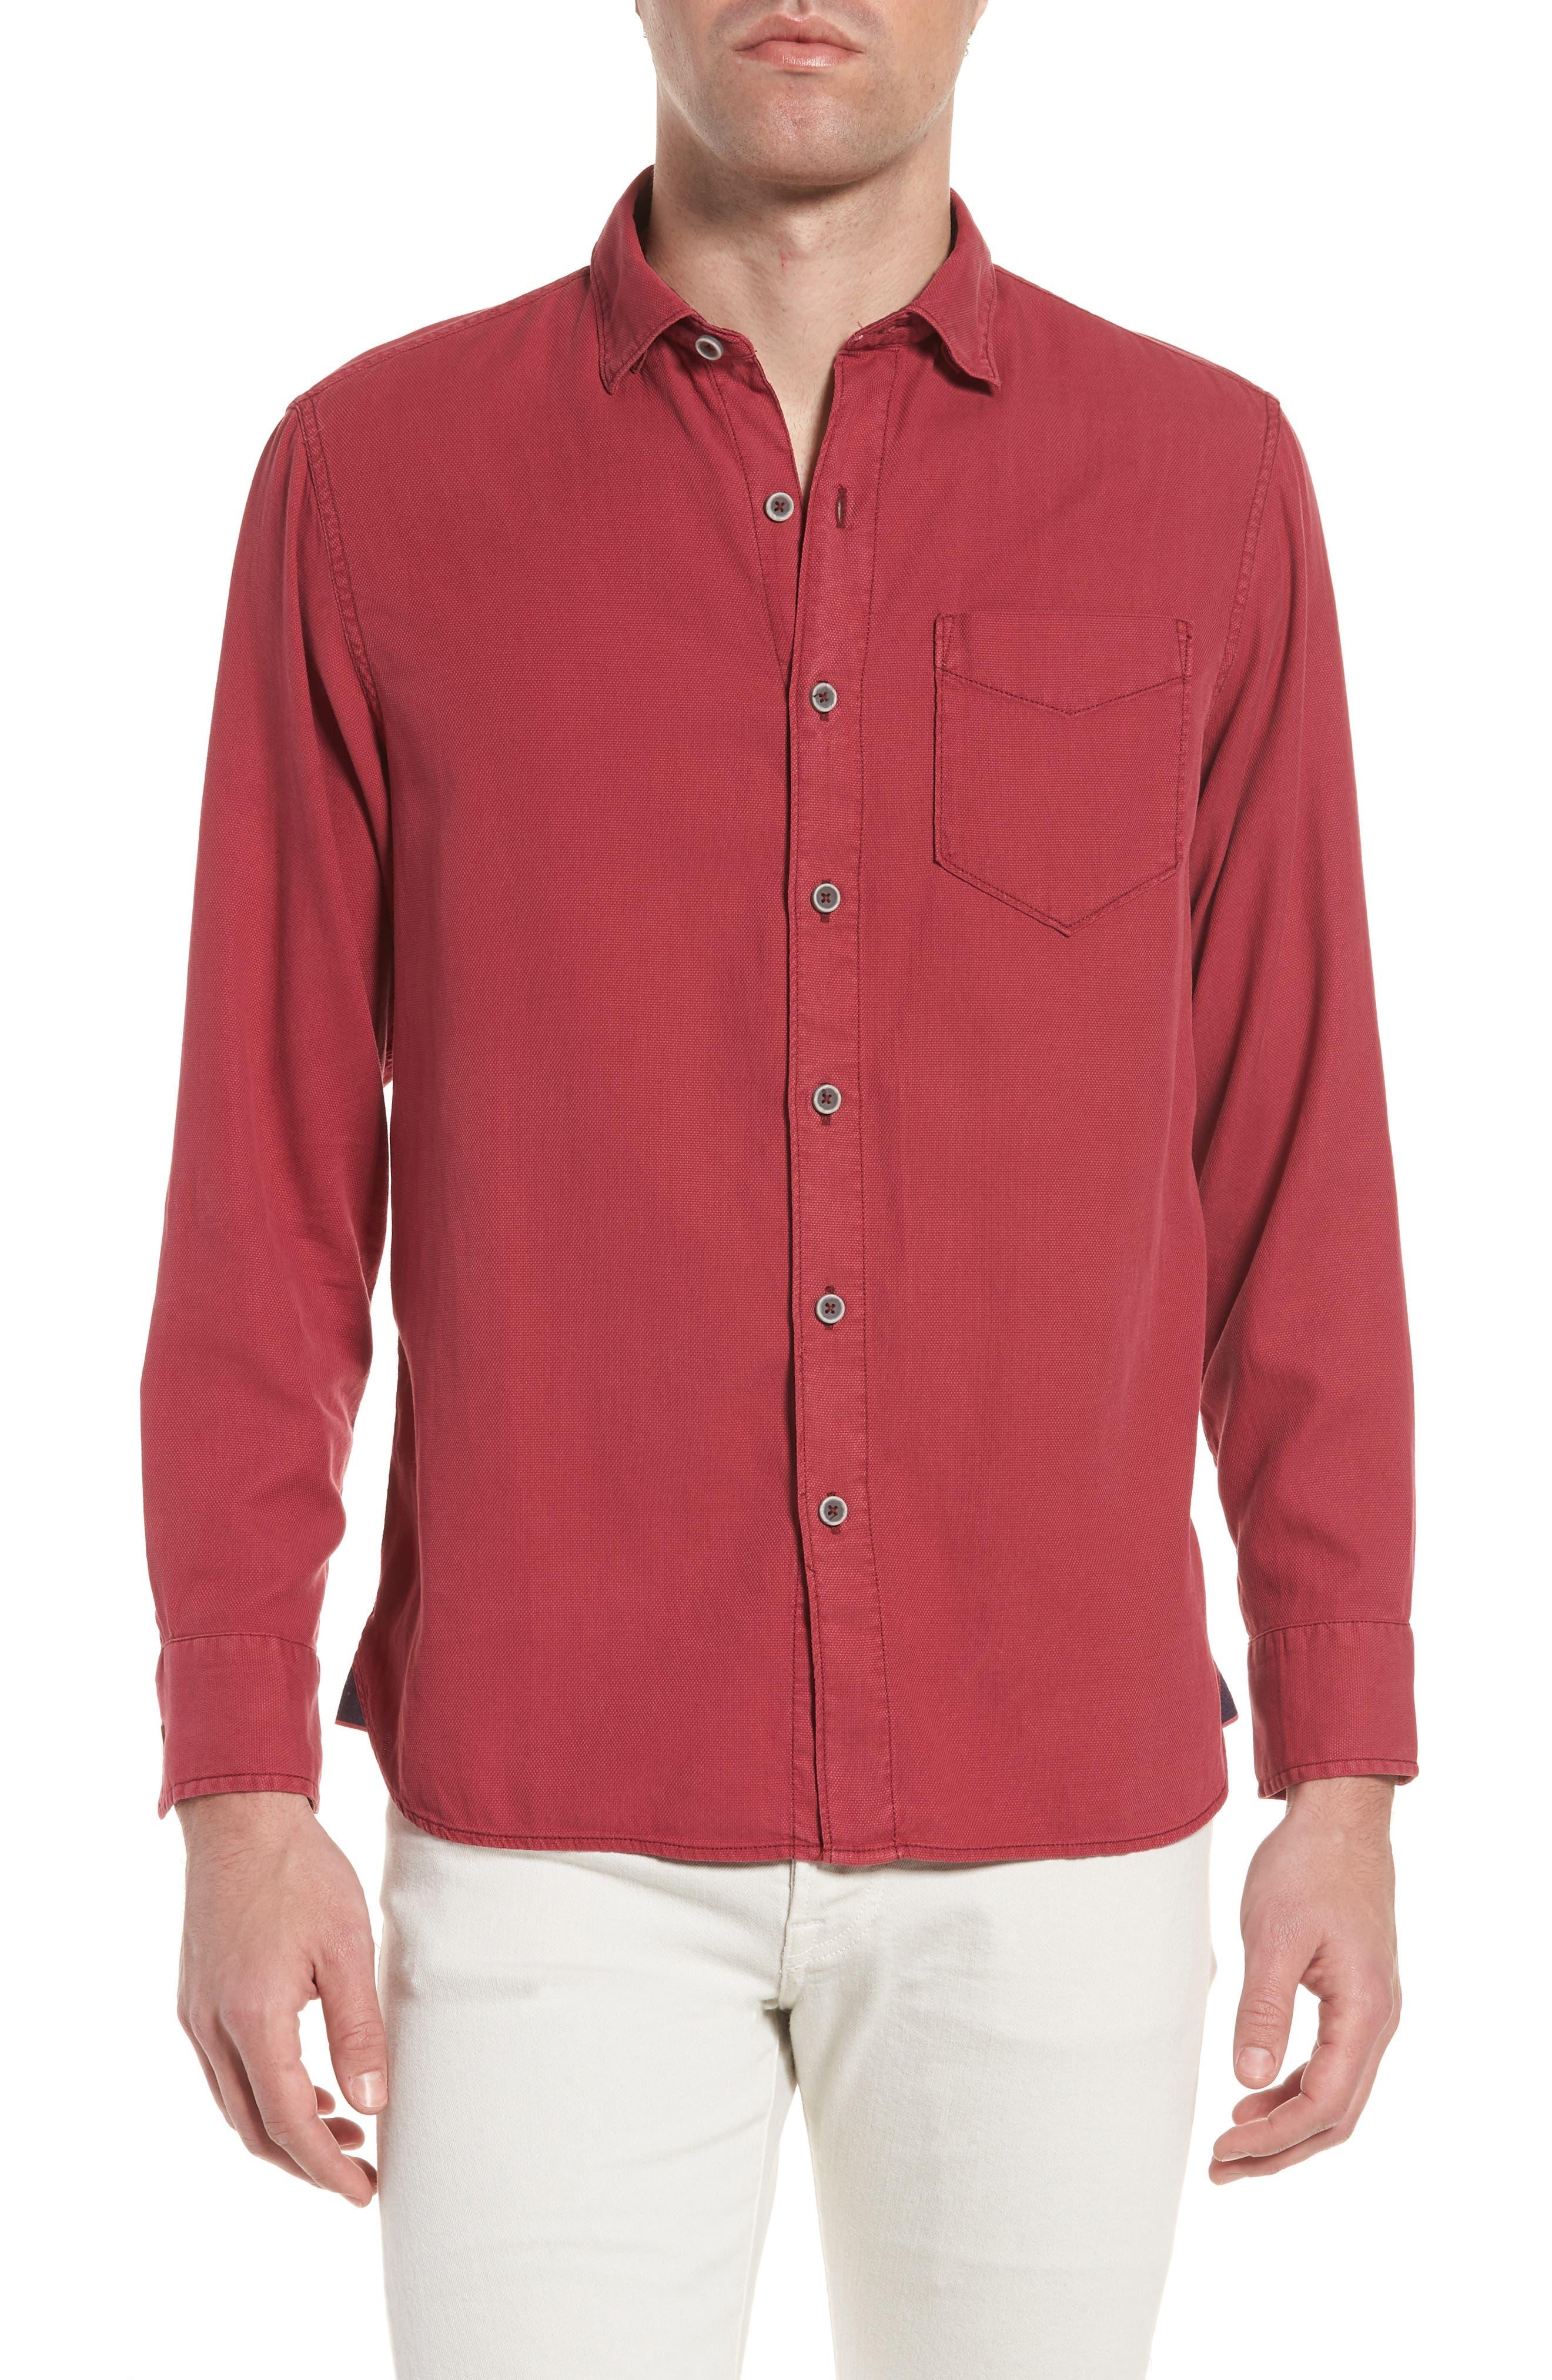 Alternate Image 1 Selected - Tommy Bahama Dobby Dylan Sport Shirt